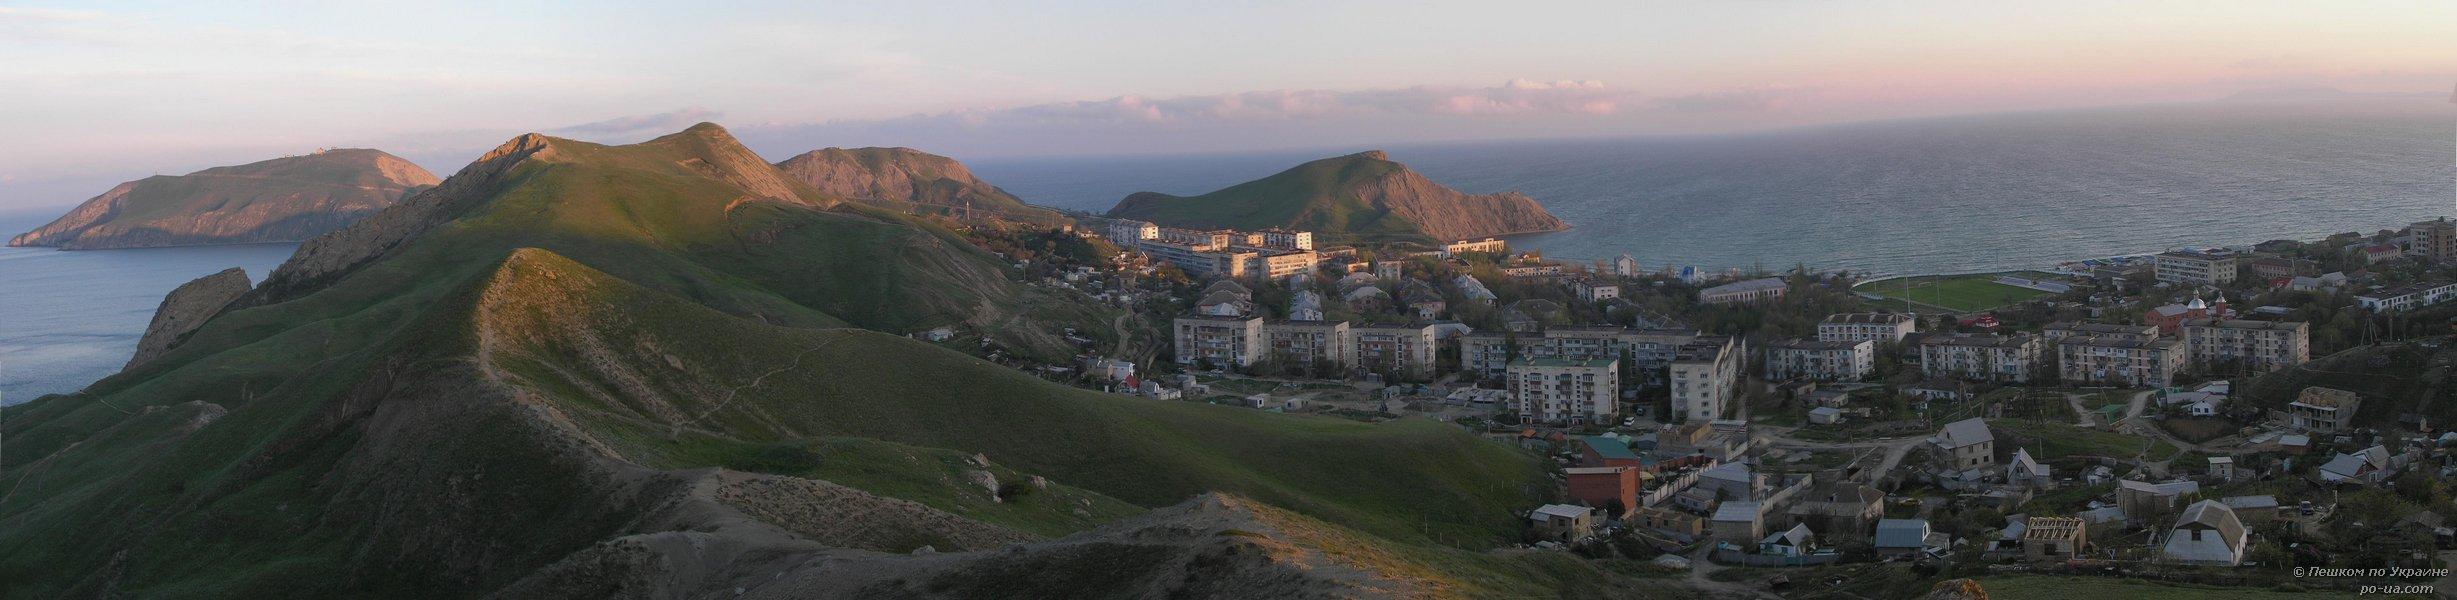 Панорама Орджоникидзе и полуострова Киик-Атлама